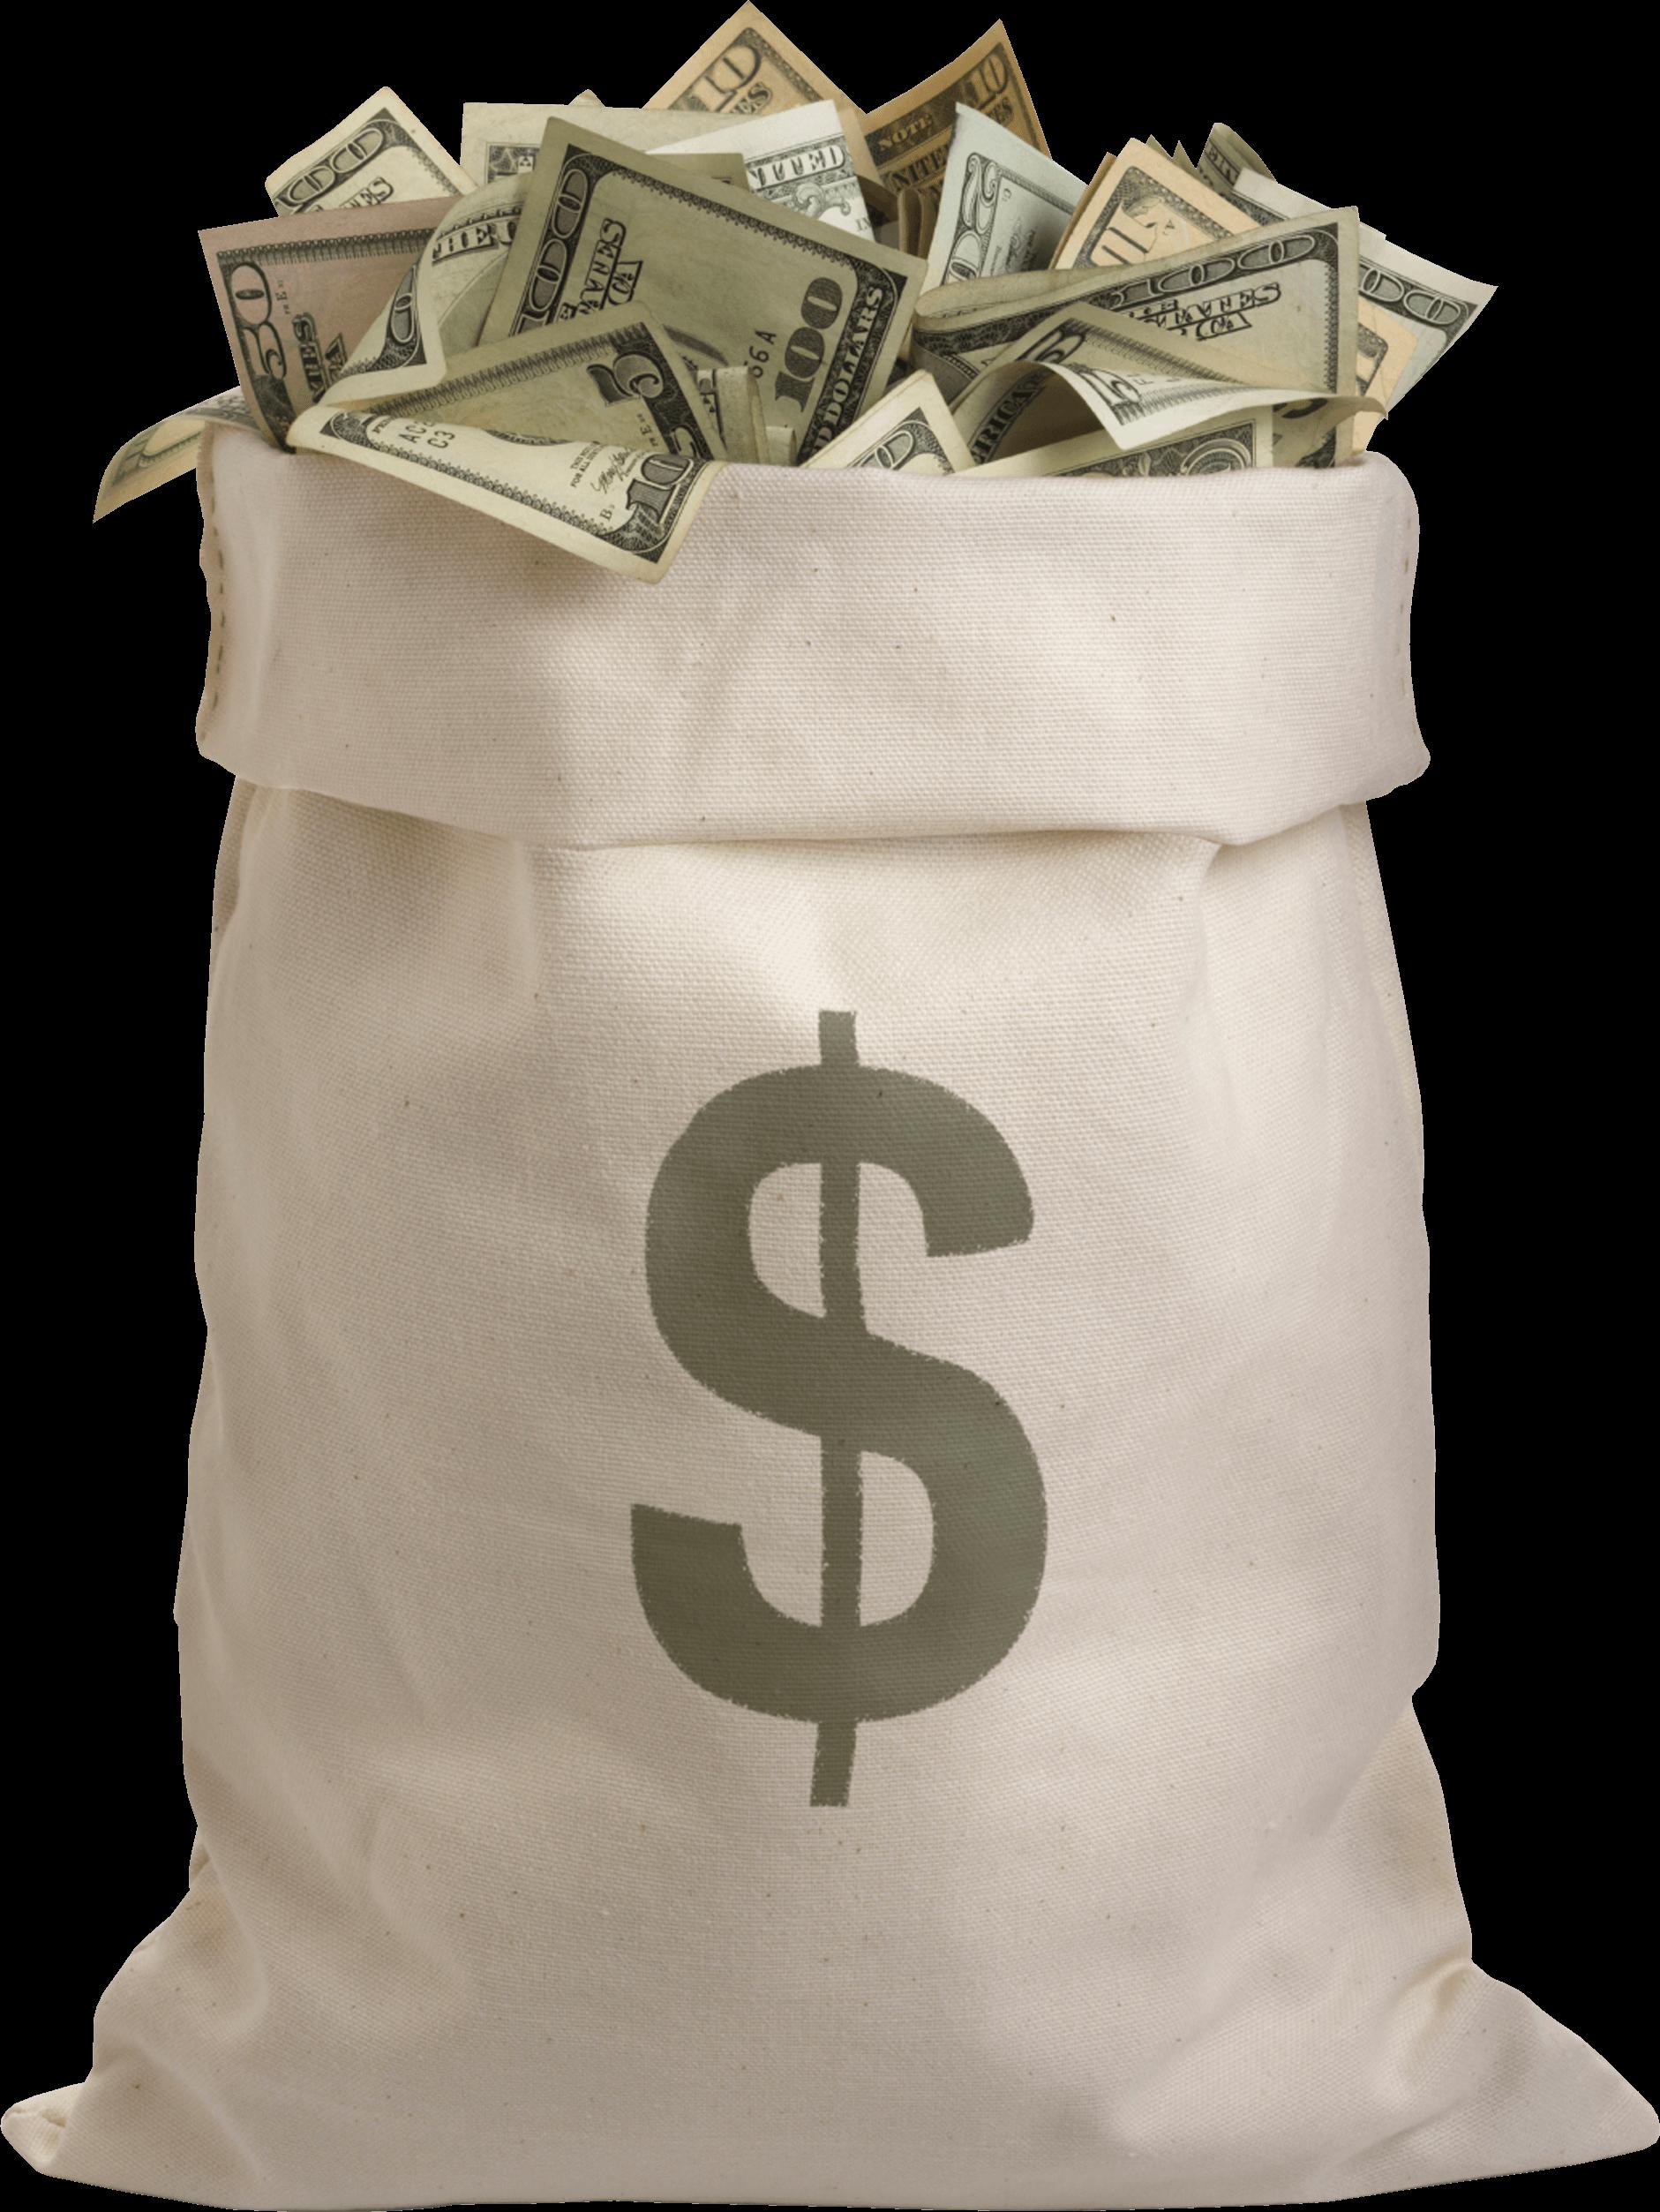 Bag Full Of Dollars Money transparent PNG.